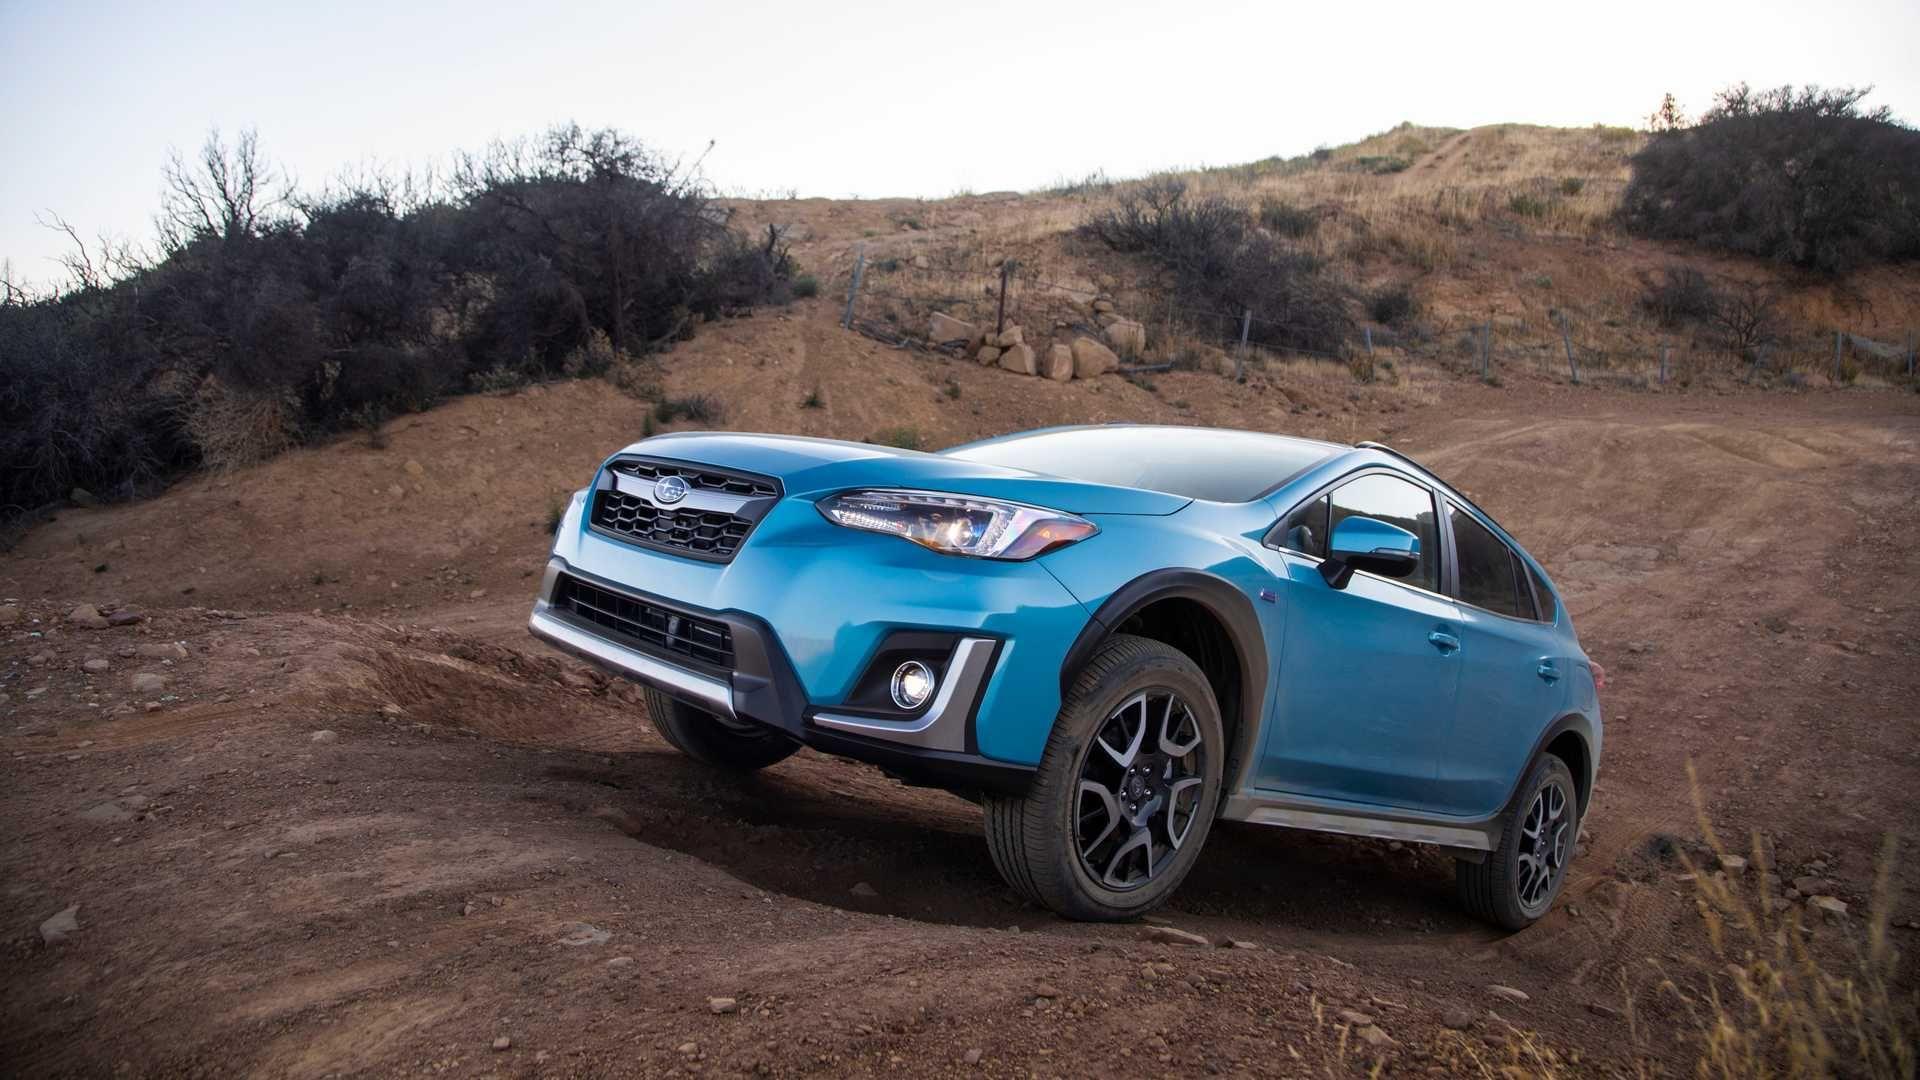 2019 Subaru Crosstrek Hybrid Is Subaru S First Plug In Hybrid Subaru Crosstrek Subaru La Auto Show